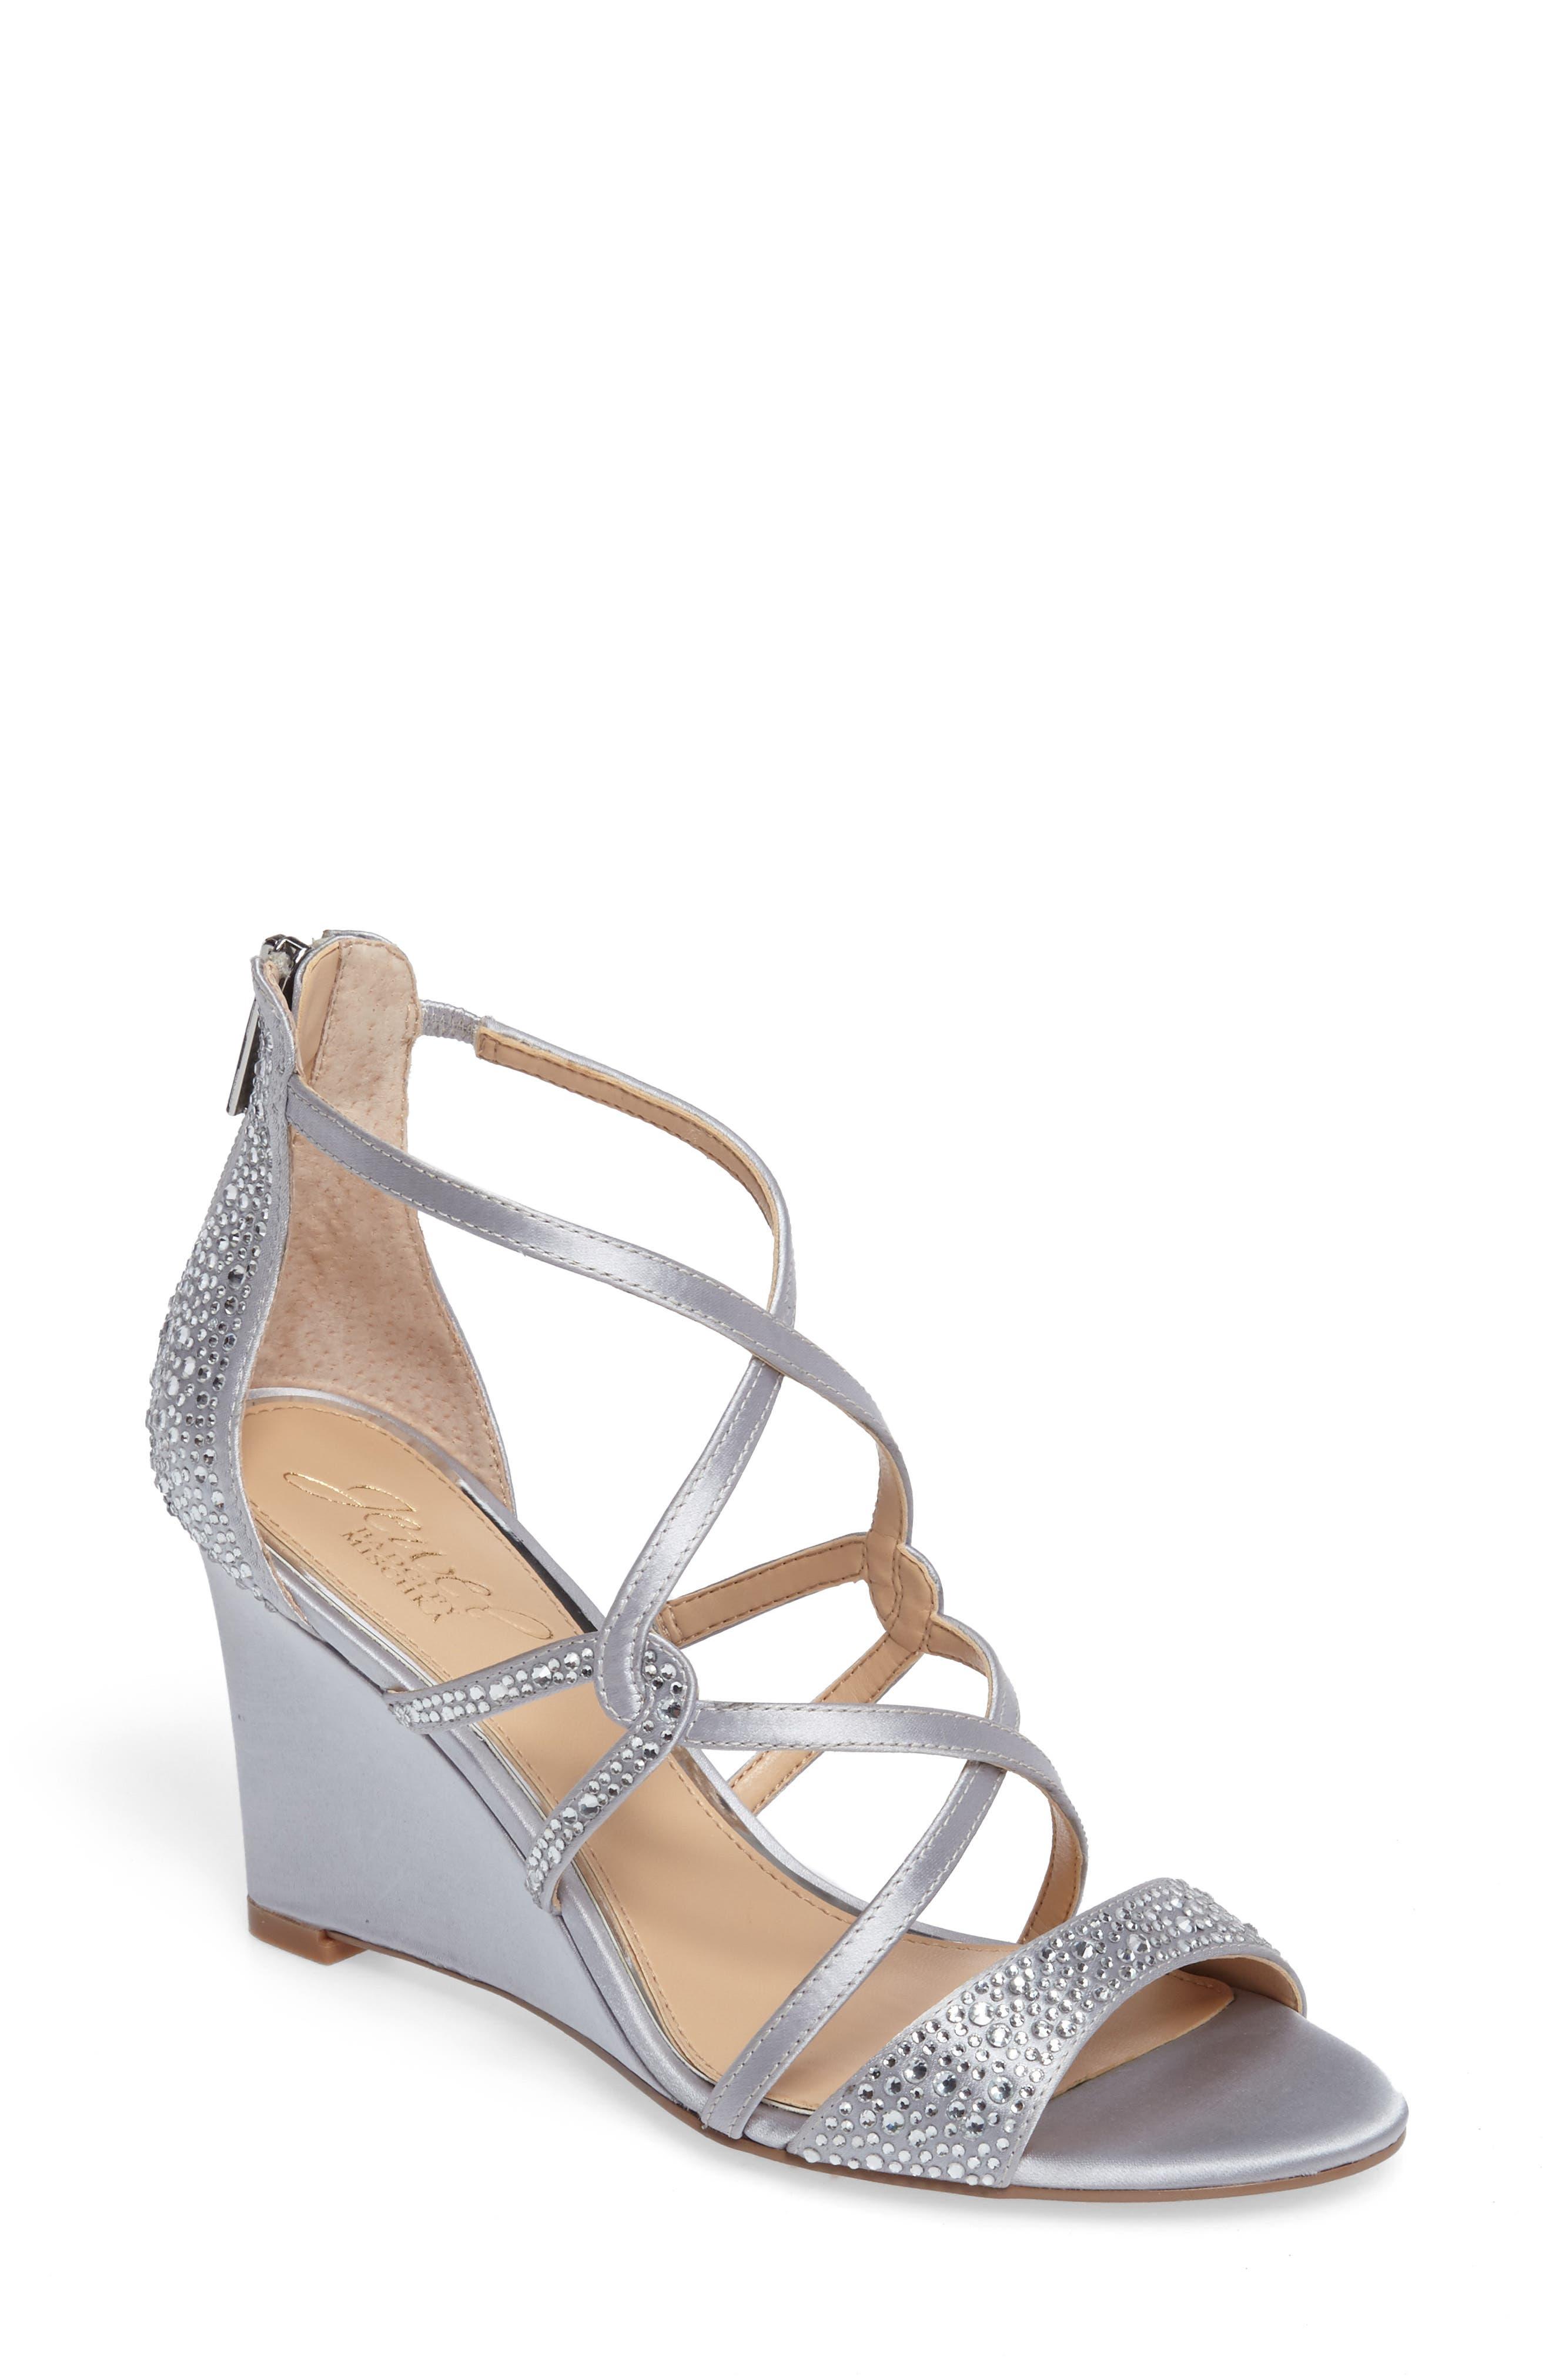 Ally II Embellished Wedge Sandal,                         Main,                         color, Silver Satin